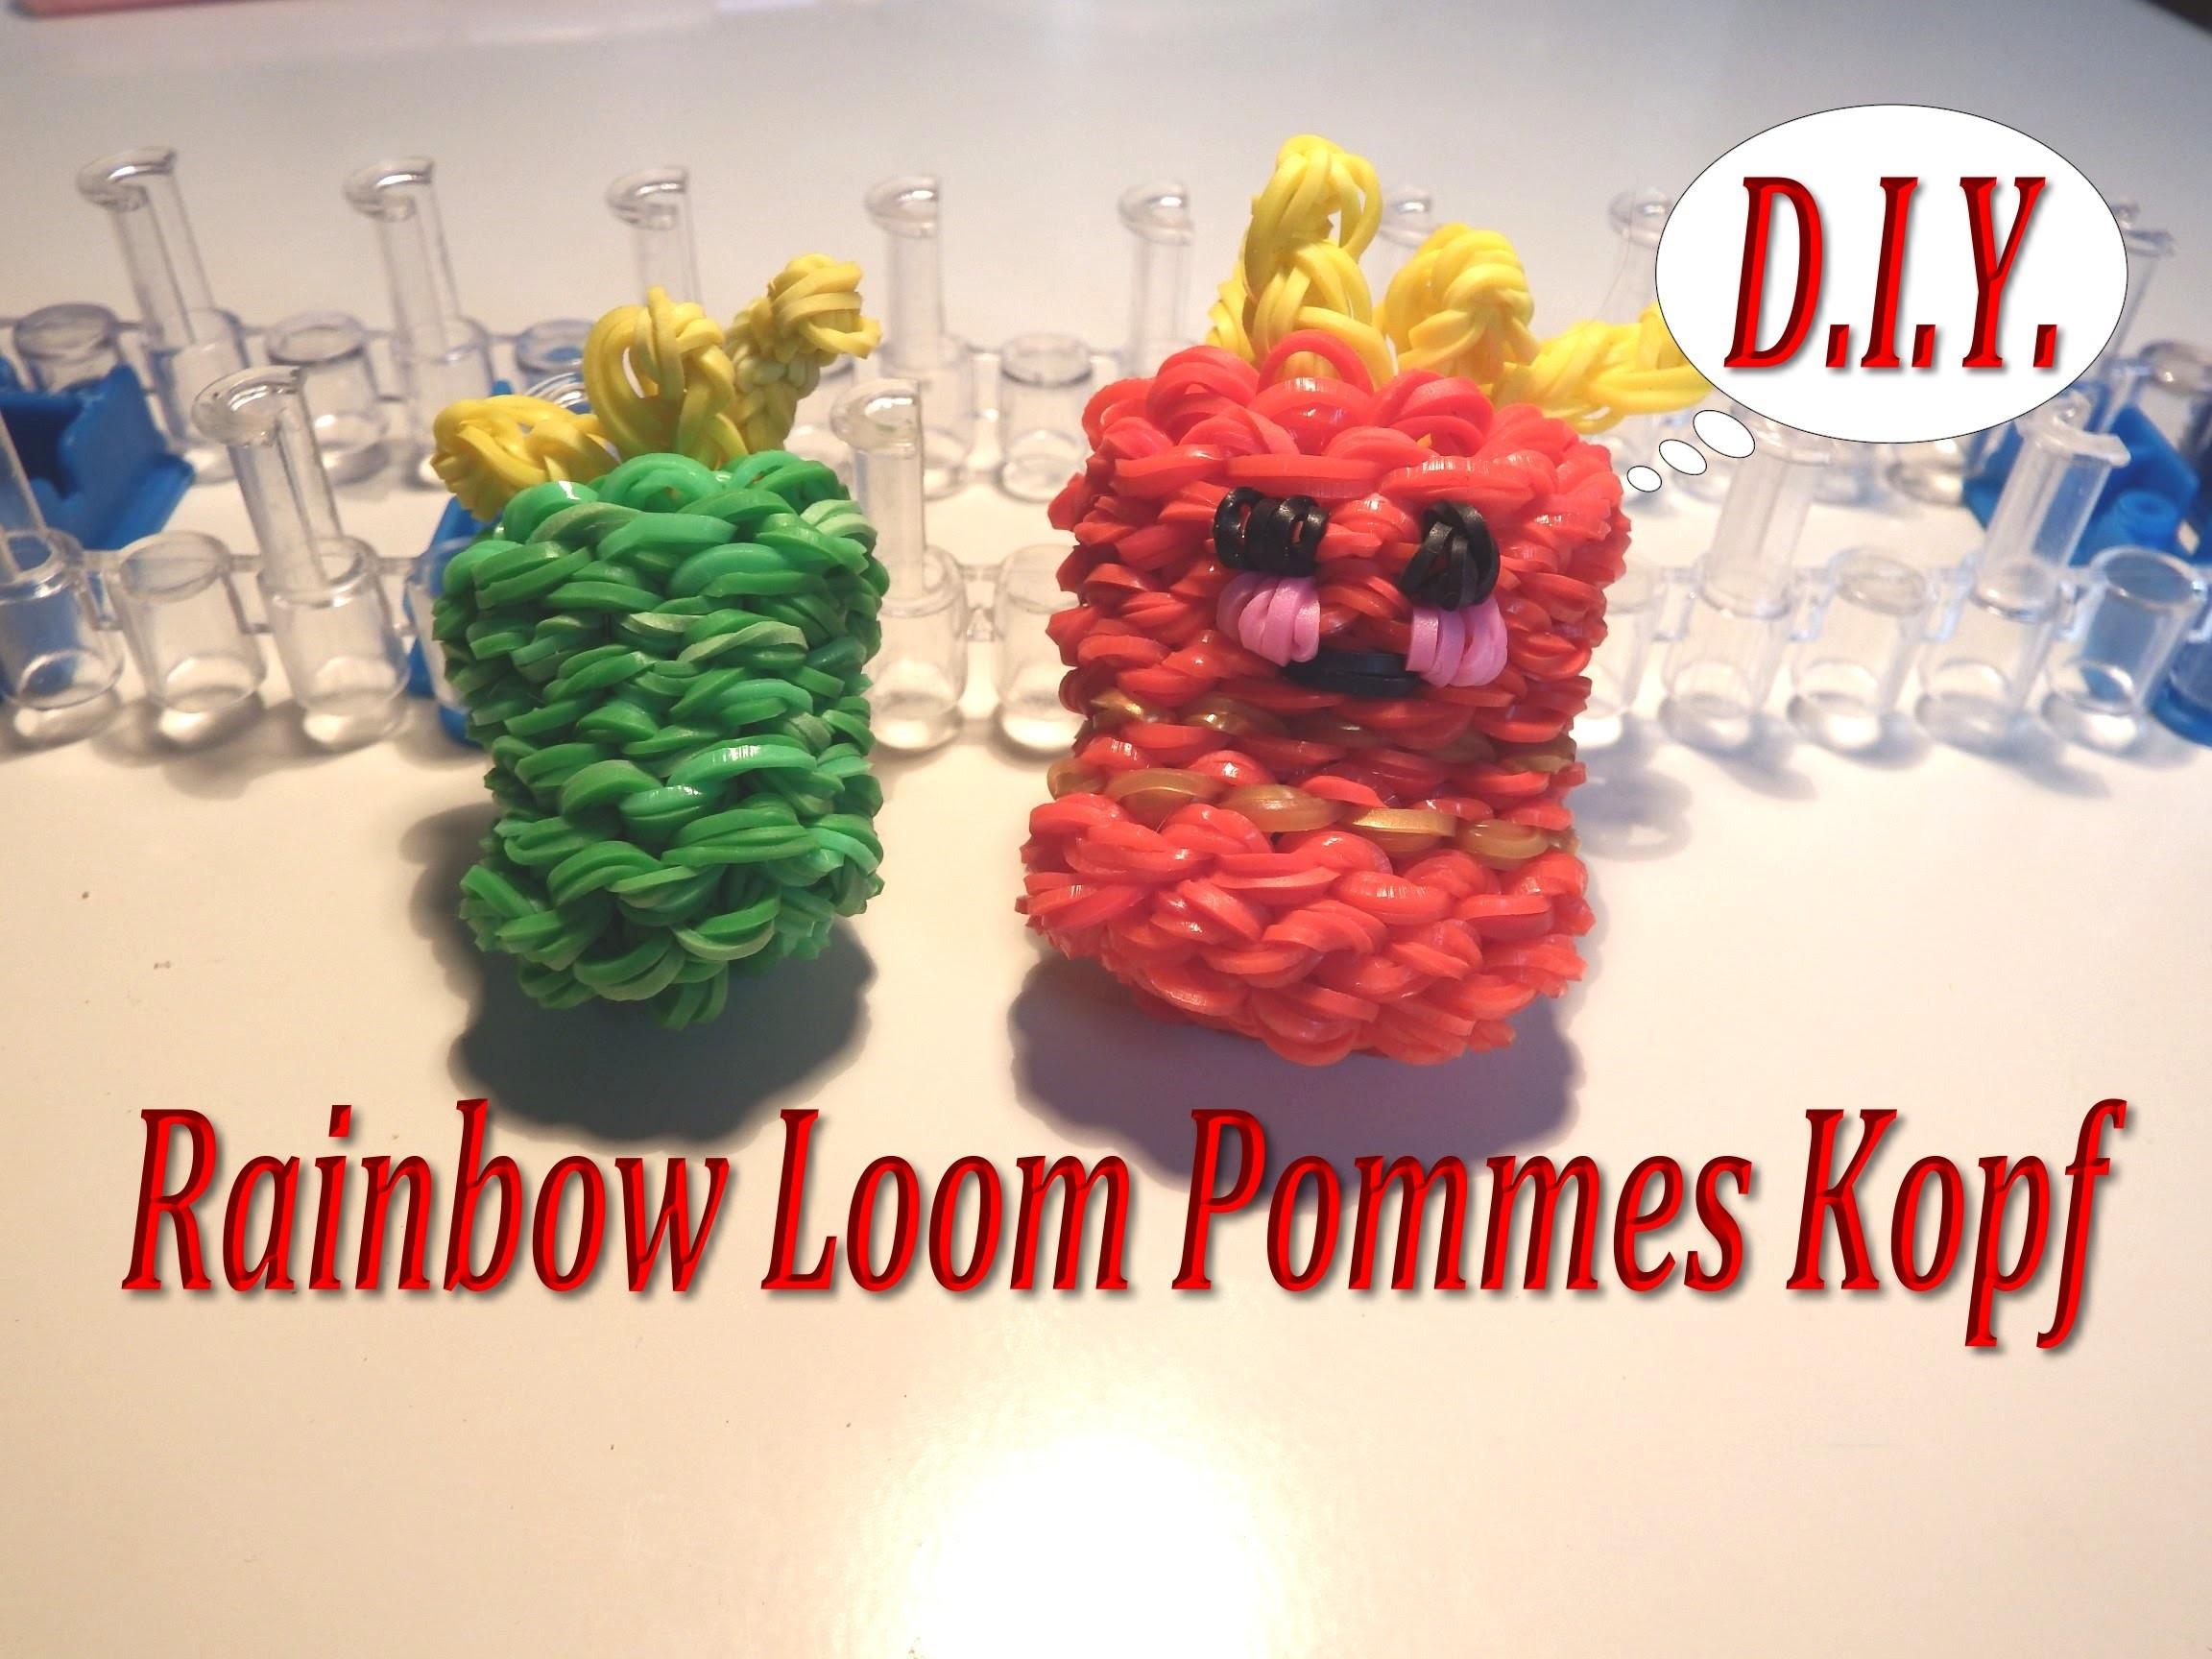 *** D.I.Y. Rainbow Loom Bands - 3D Pommes Kopf -Tini ***